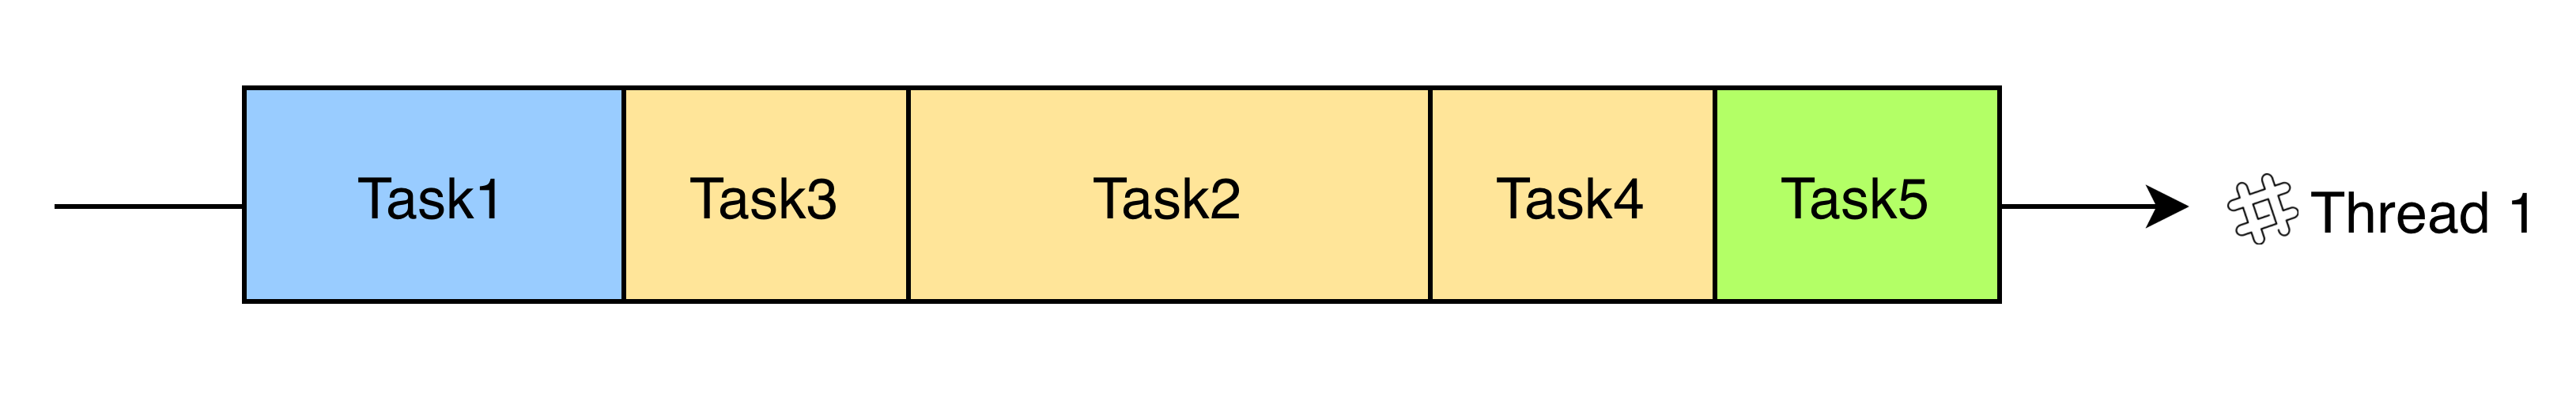 Concurrent data flow path: 13245